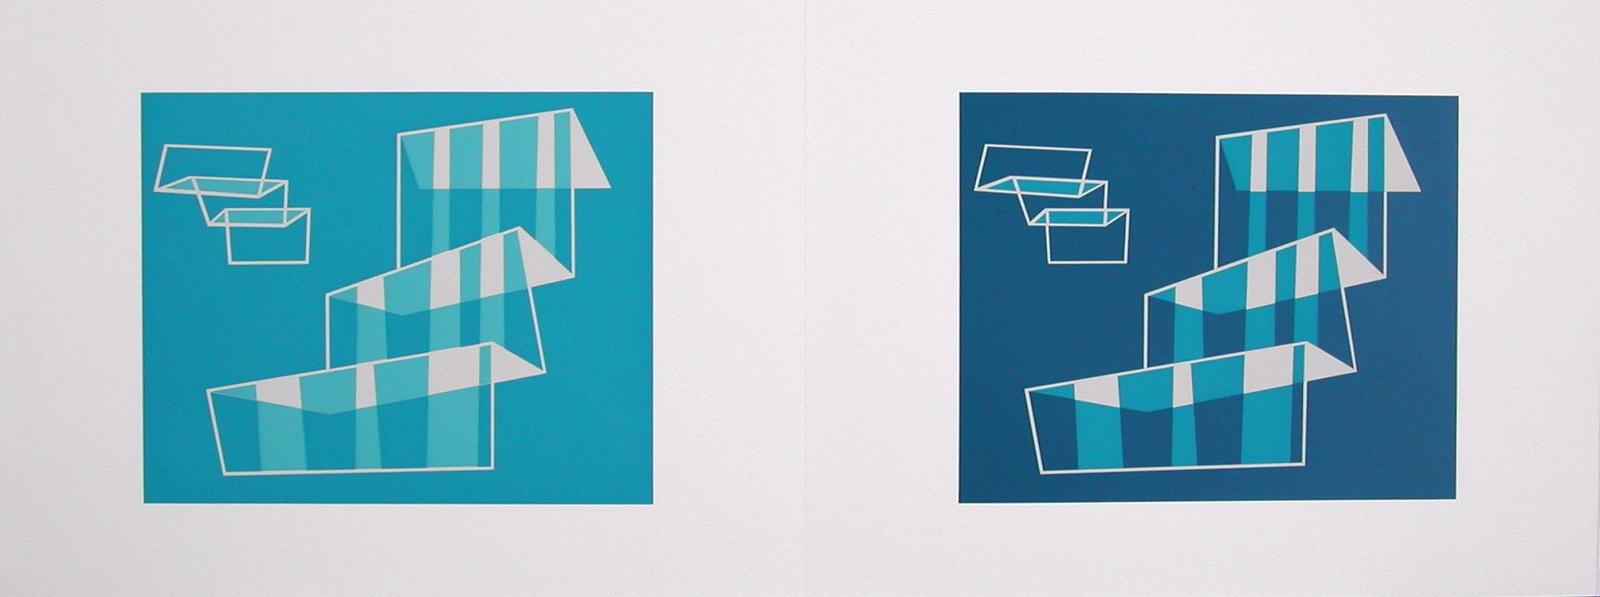 Josef Albers, Formulation : Articulation, Folio I, Folder 1